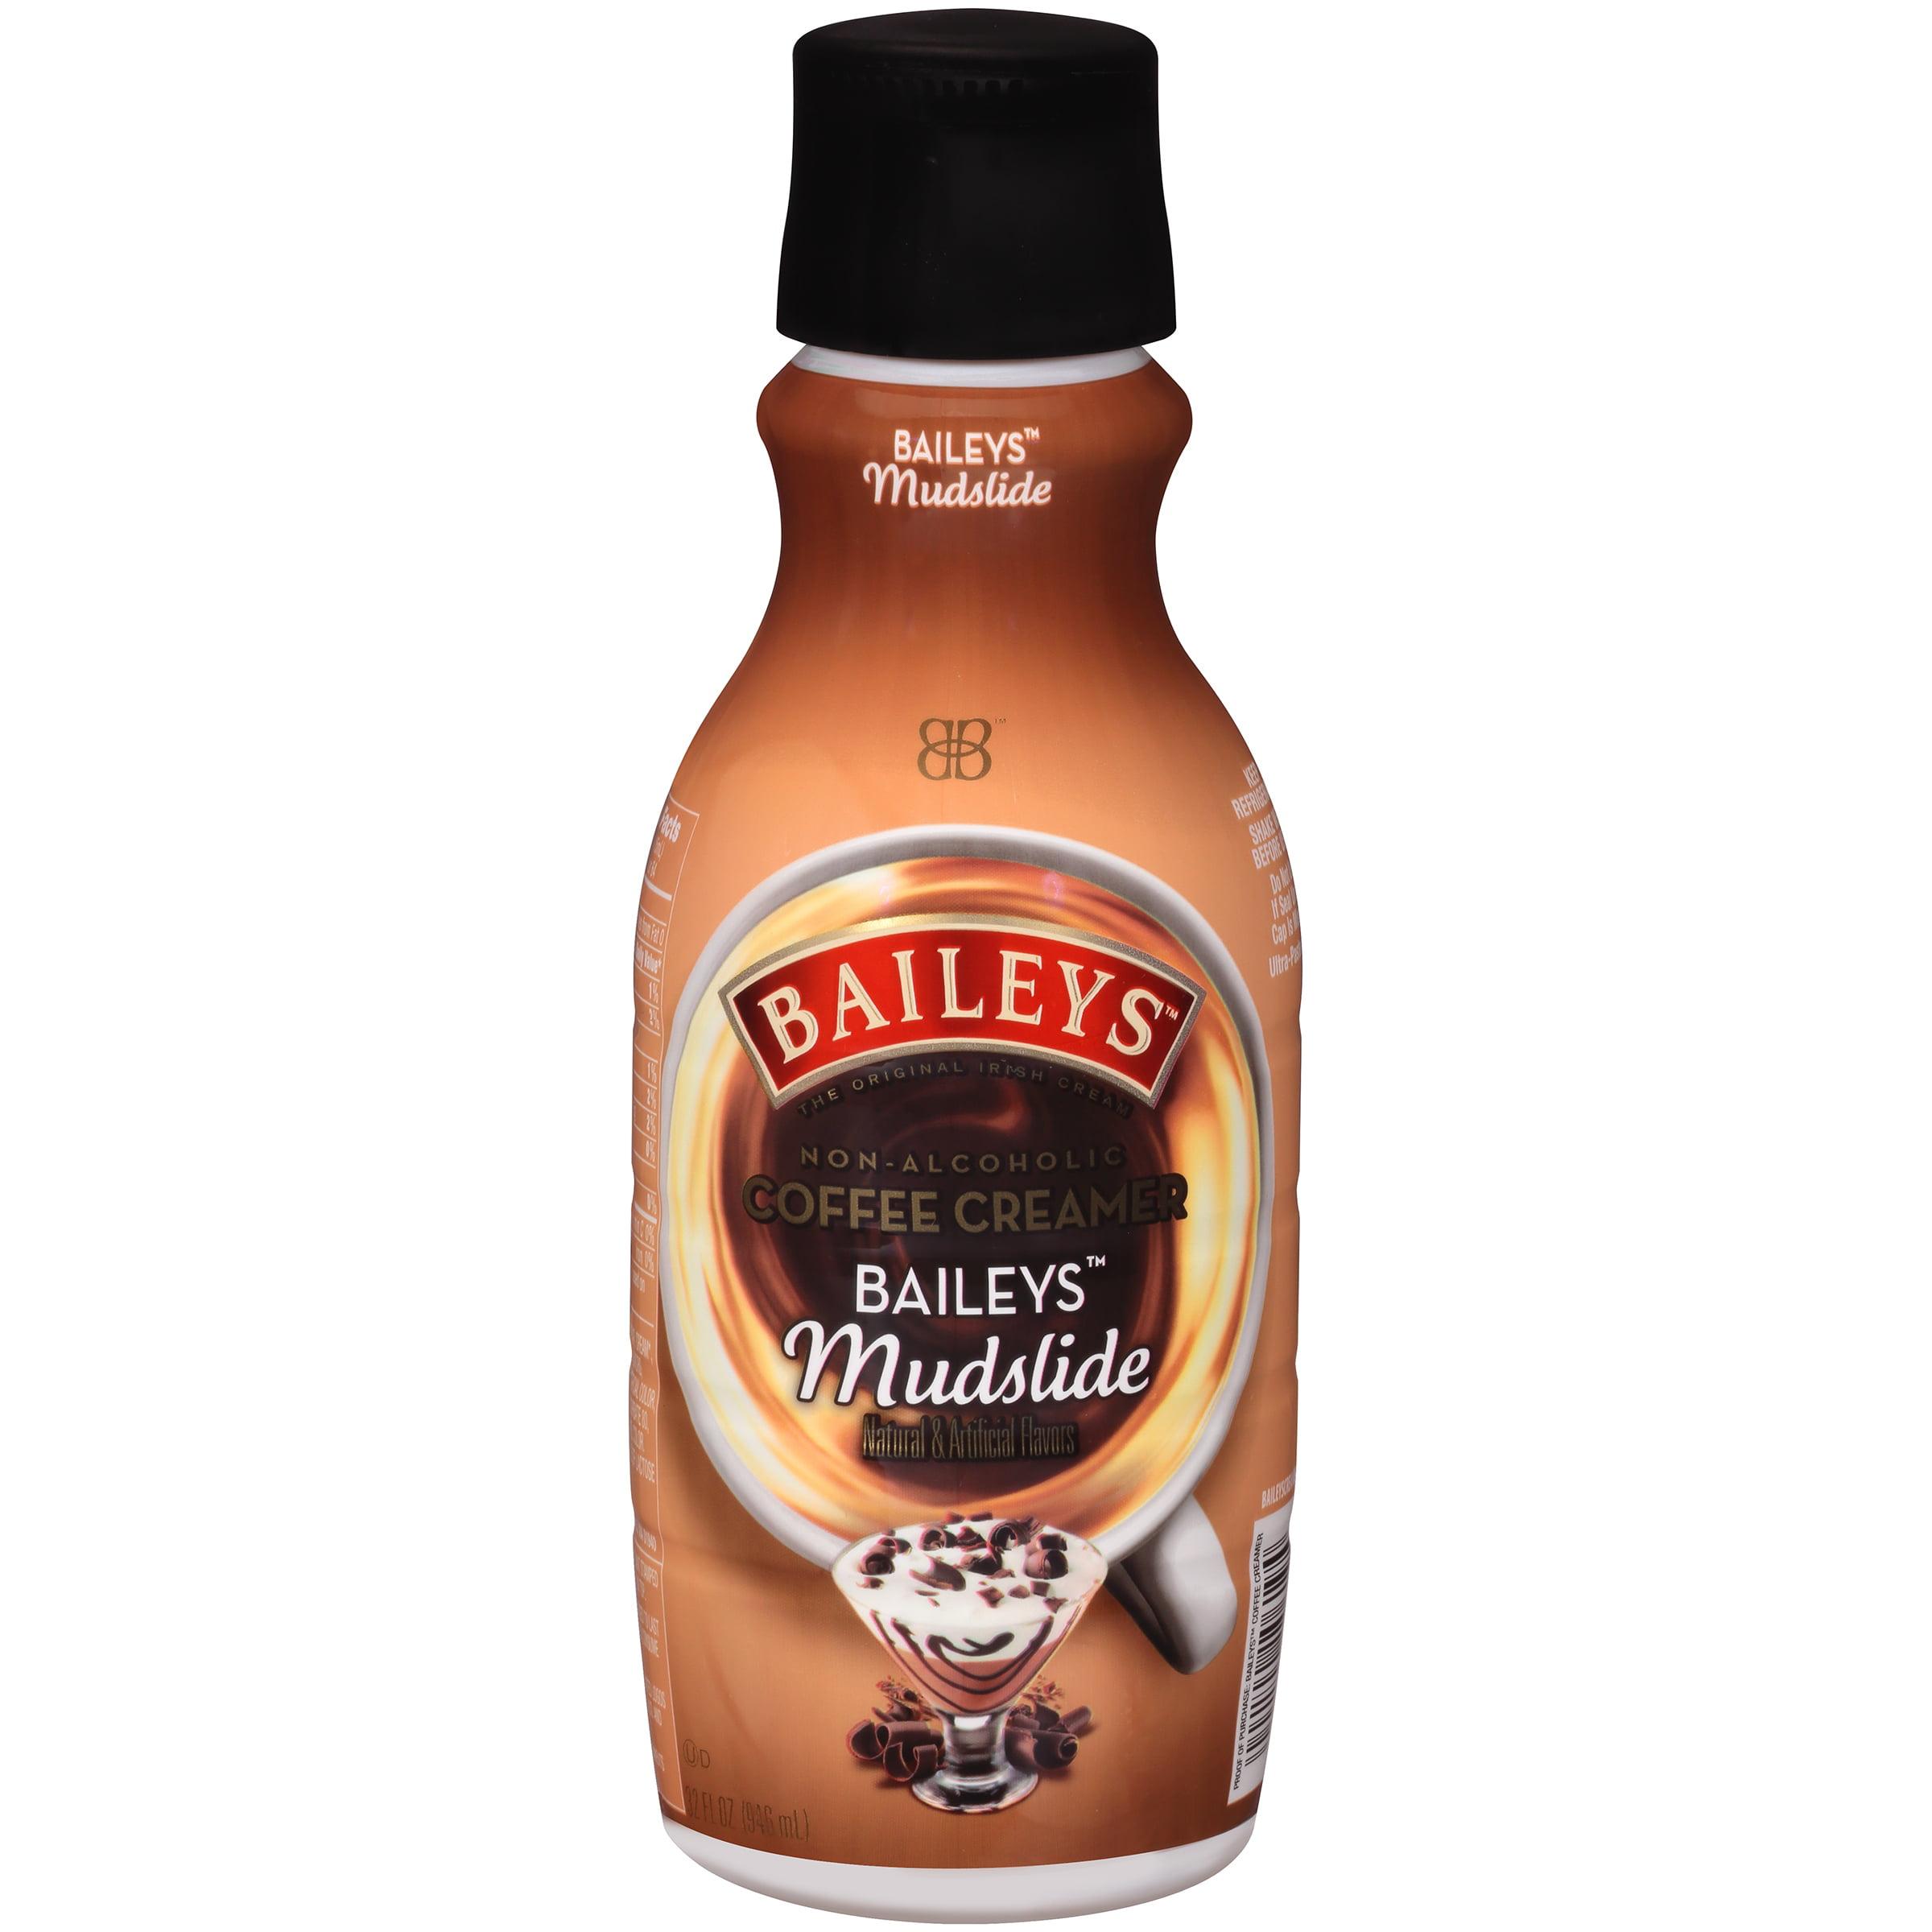 Baileys Non-Alcoholic Mudslide Coffee Creamer, 1 Quart